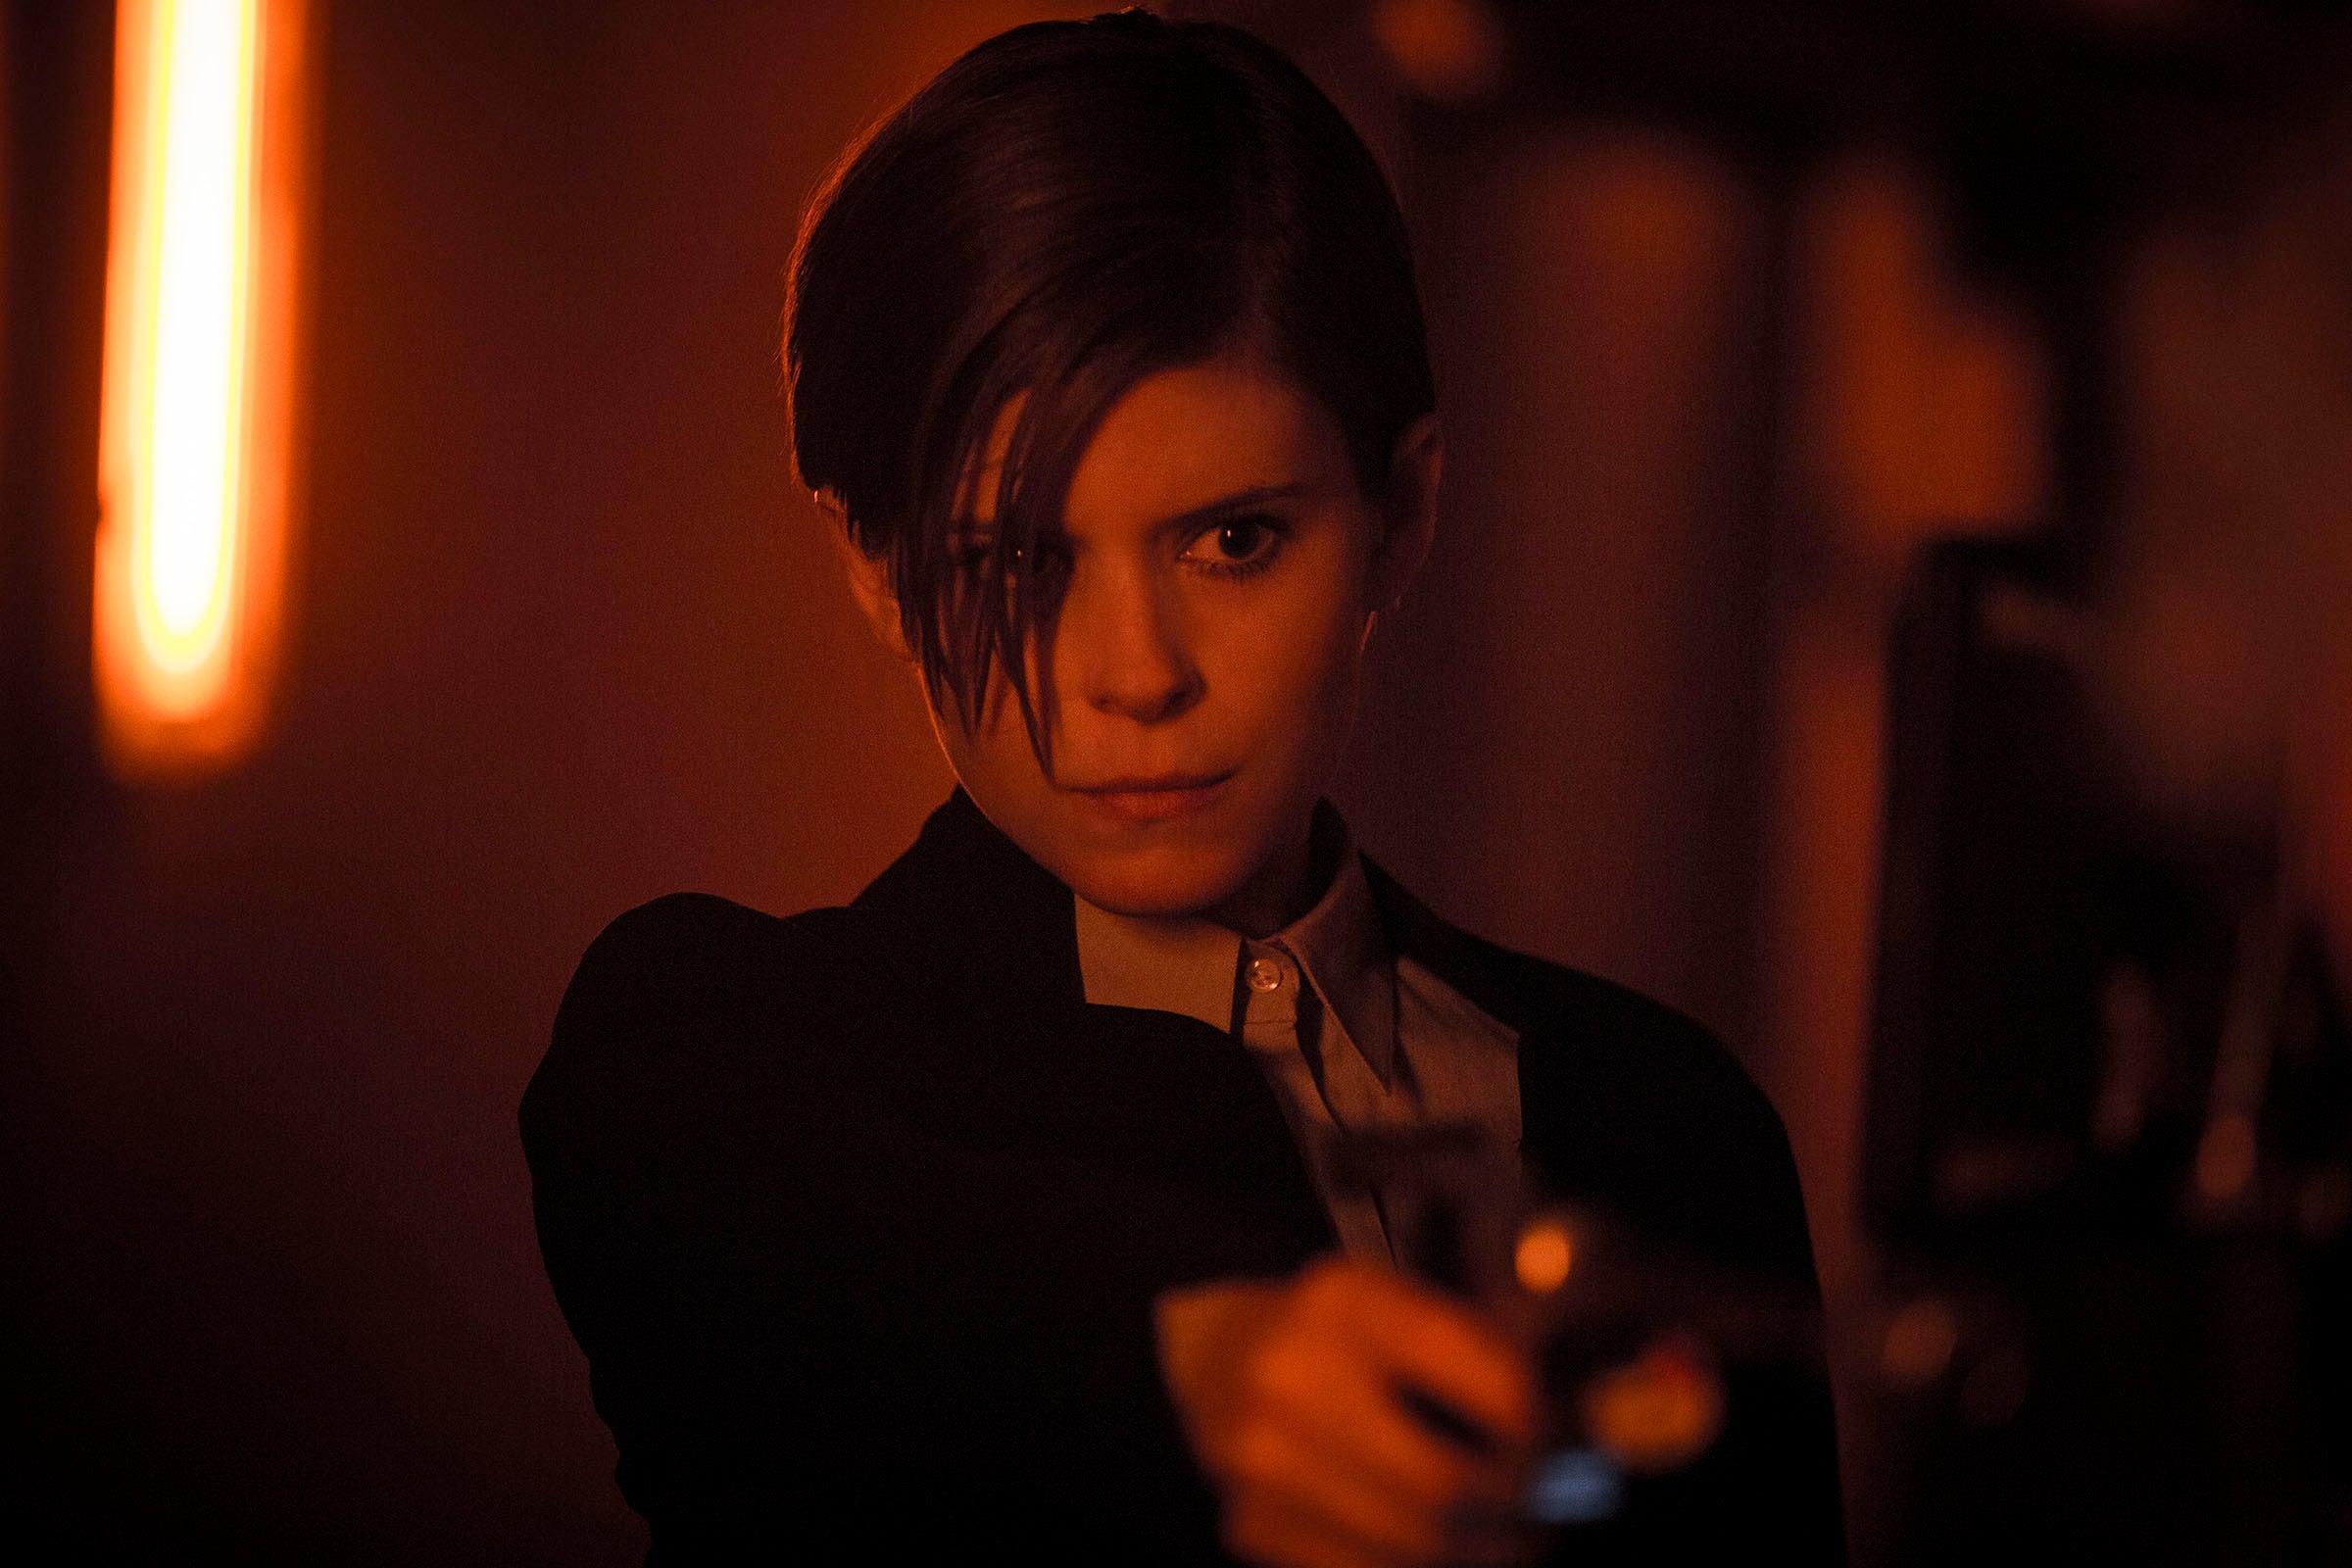 Scifi Thriller Morgan Is a Striking But Predictable Modern Monster Movie